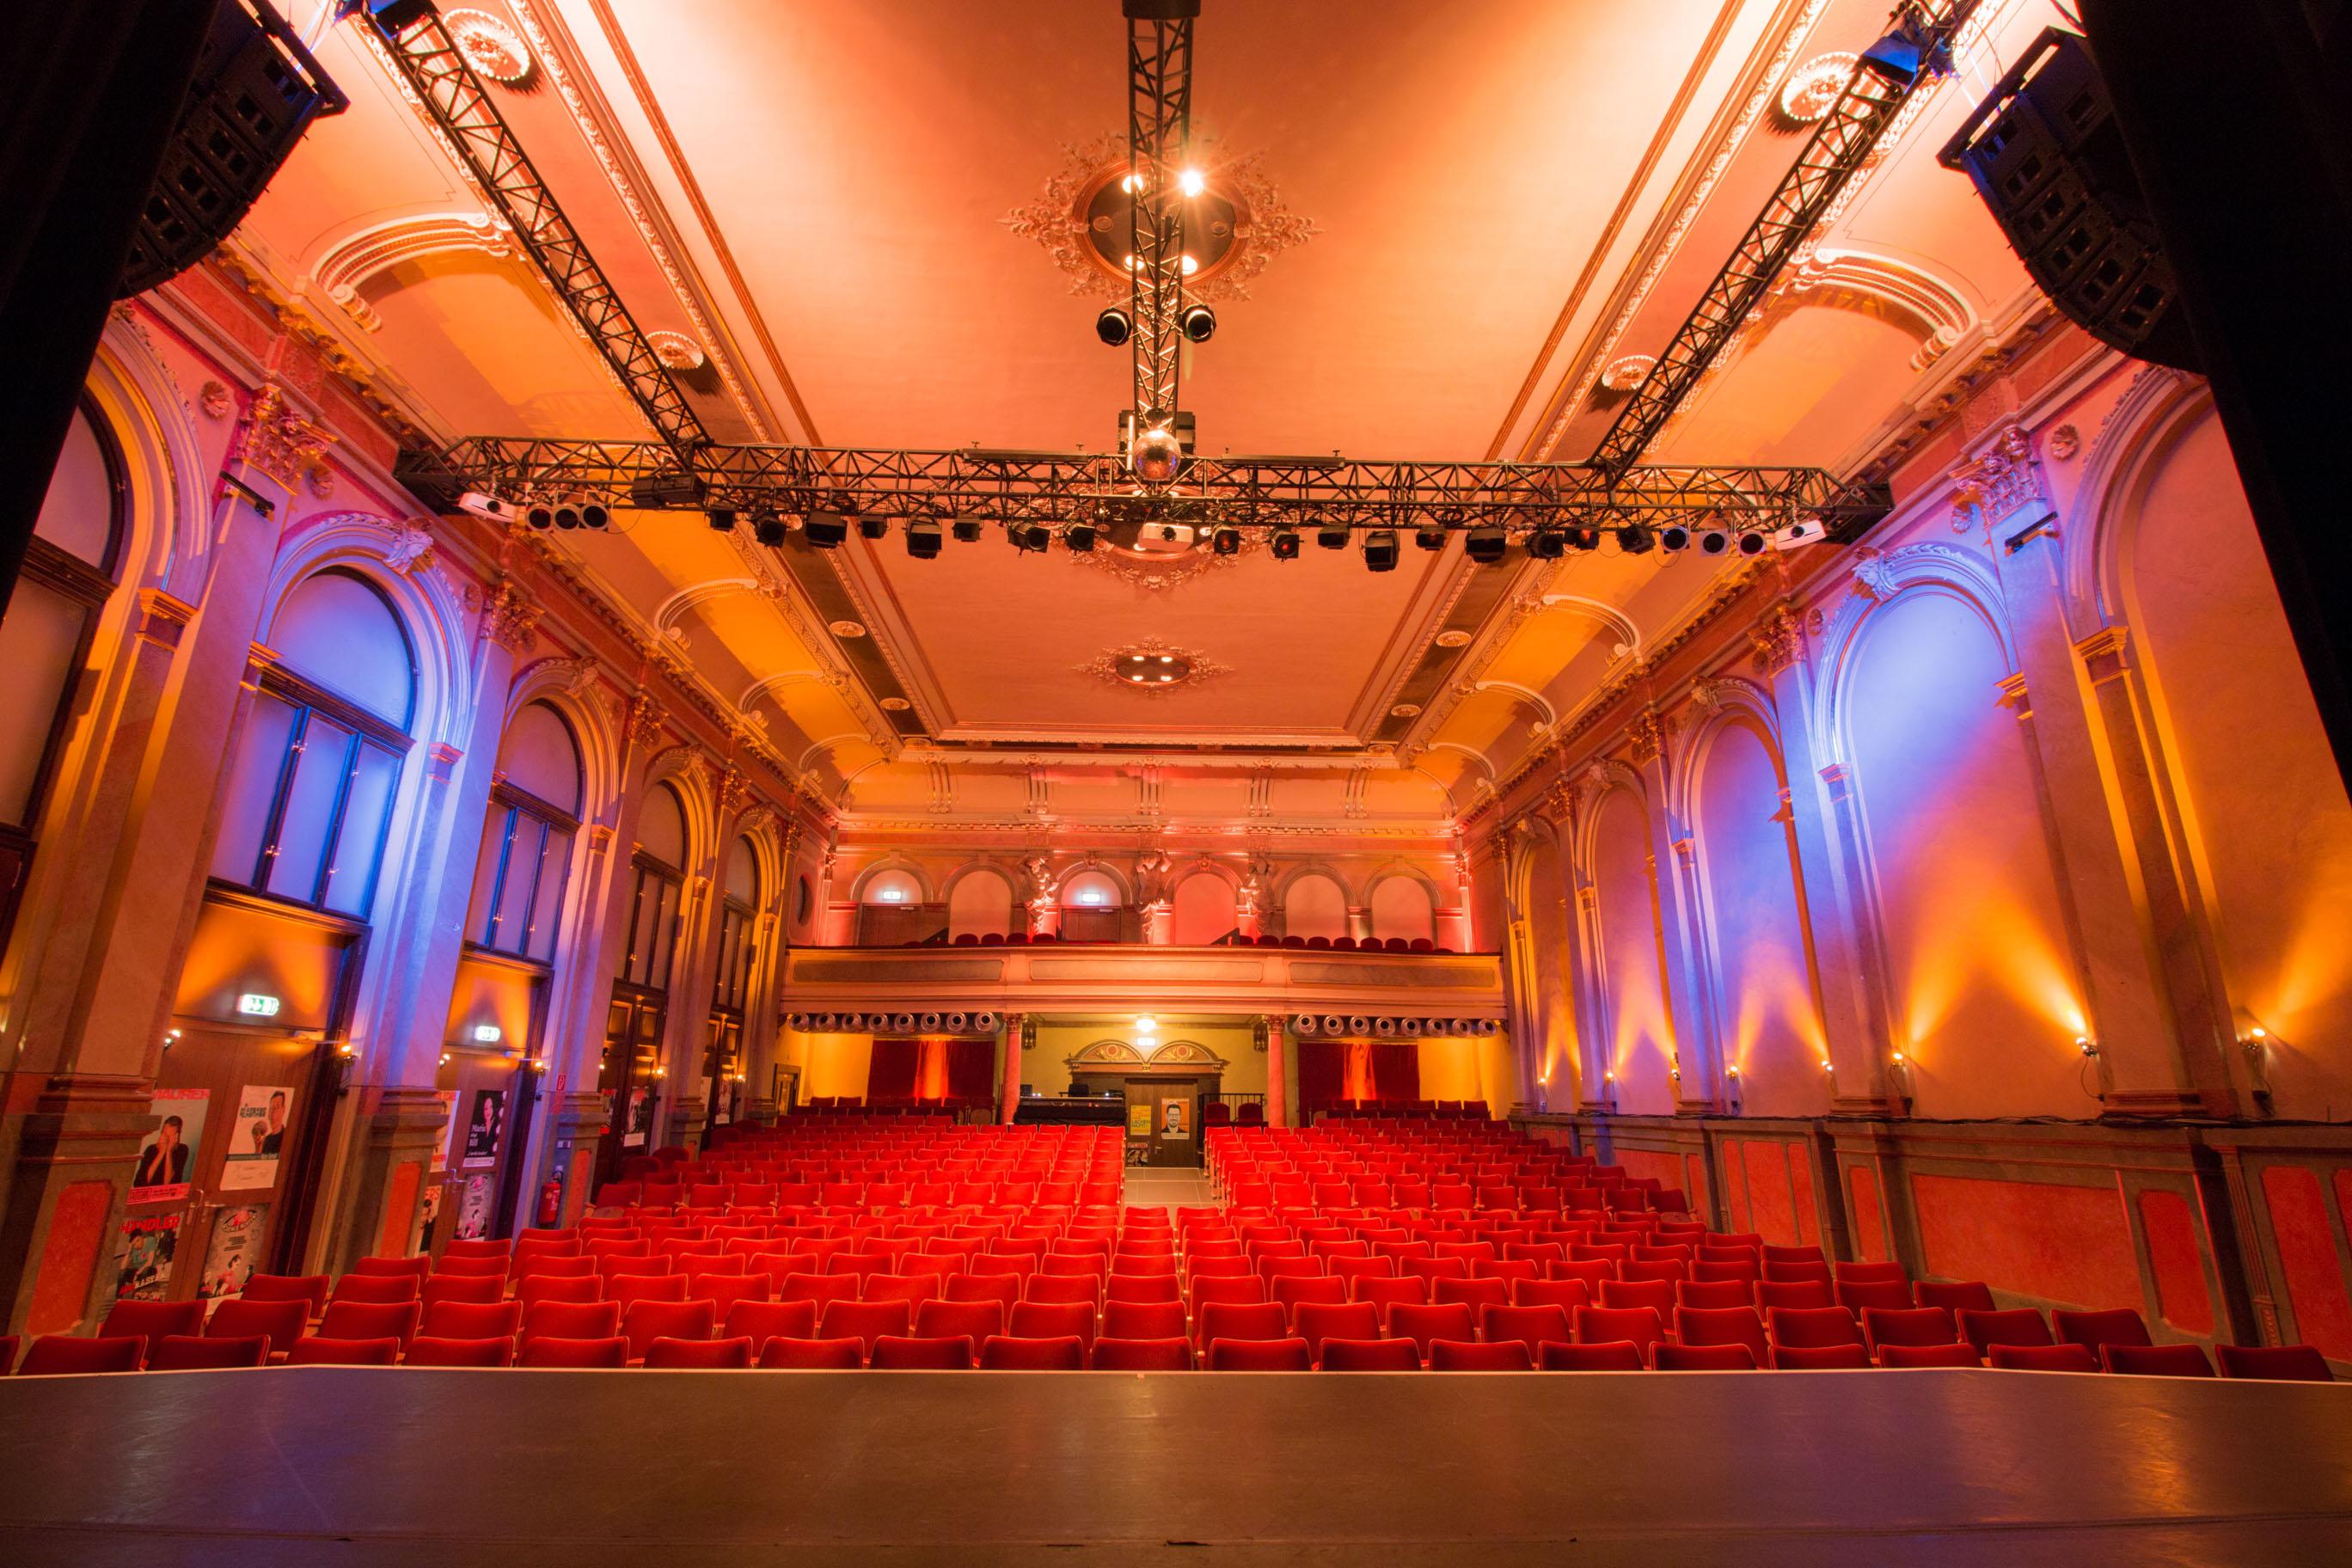 Stadtsaal Kabarettisten Aus österreich Inskabarettat